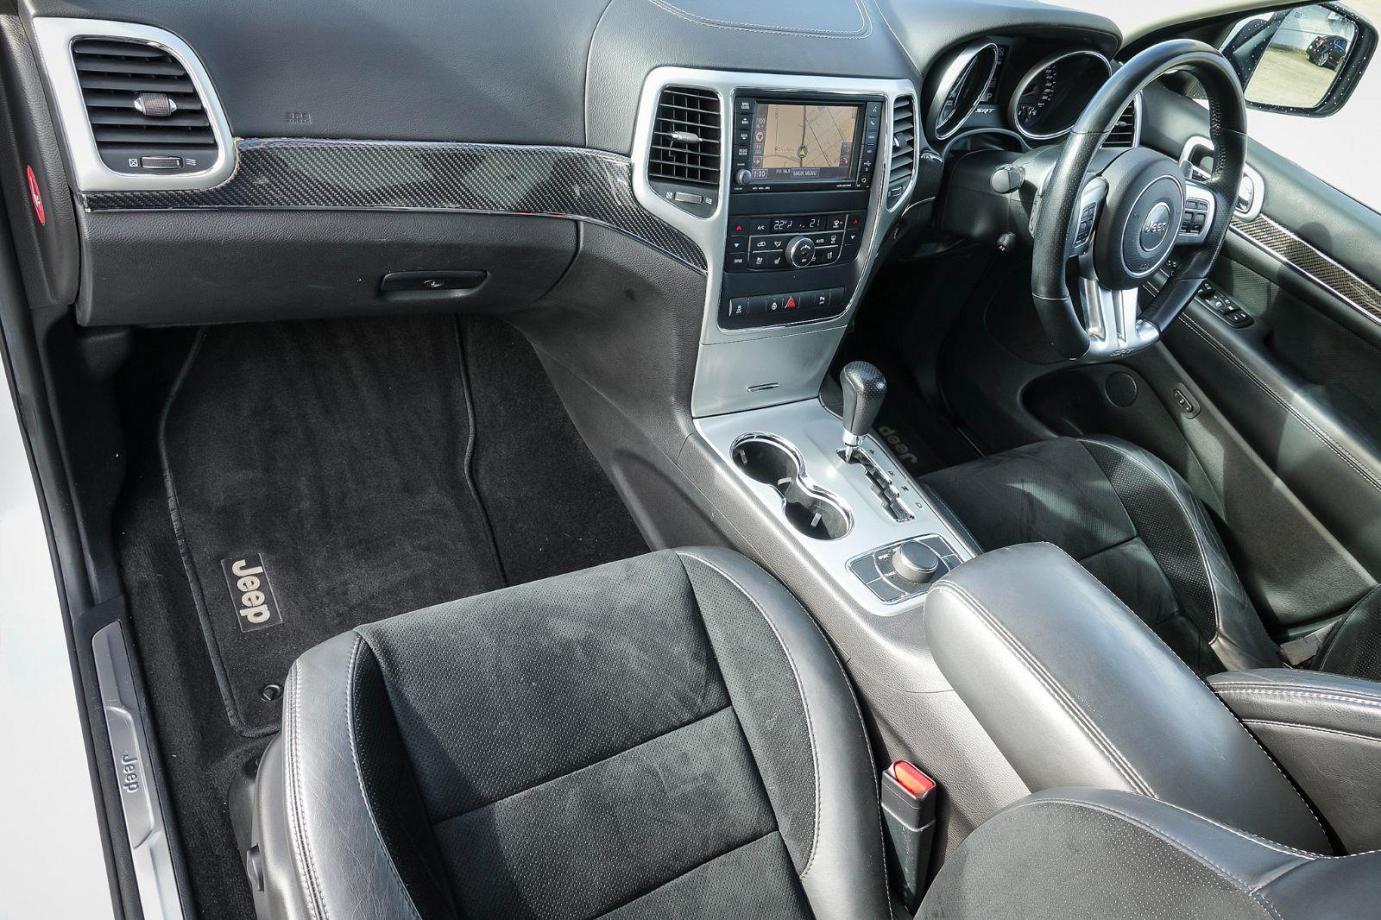 2012 Jeep Grand Cherokee WK MY13 SRT-8 Alpine Wagon 5dr Spts Auto 5sp 4x4 6.4i